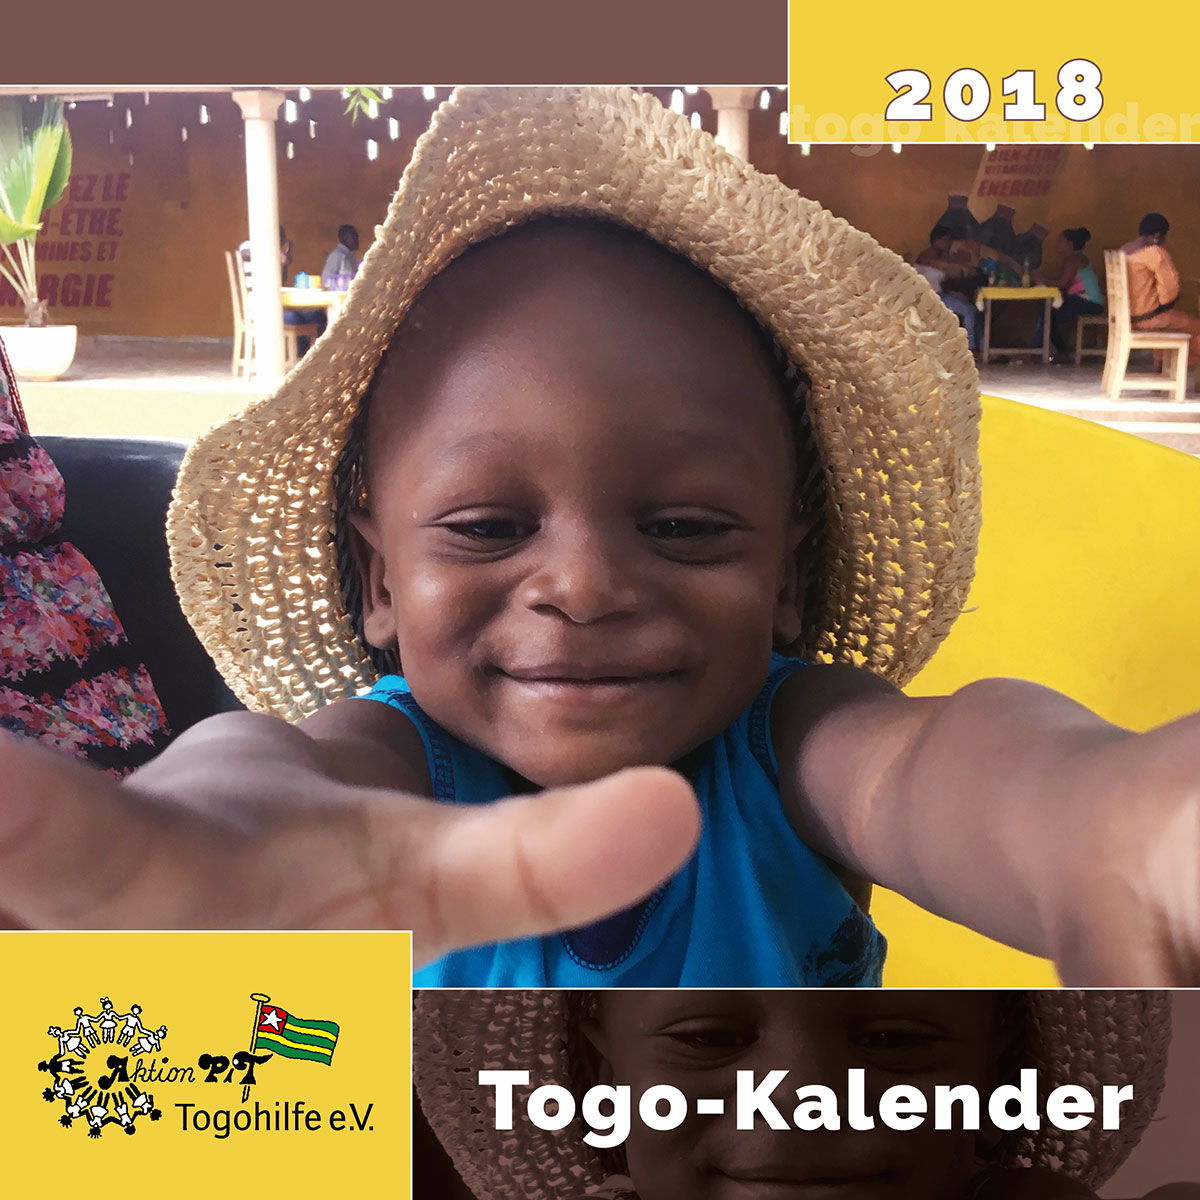 Das Titelblatt des Togo-Kalenders 2018